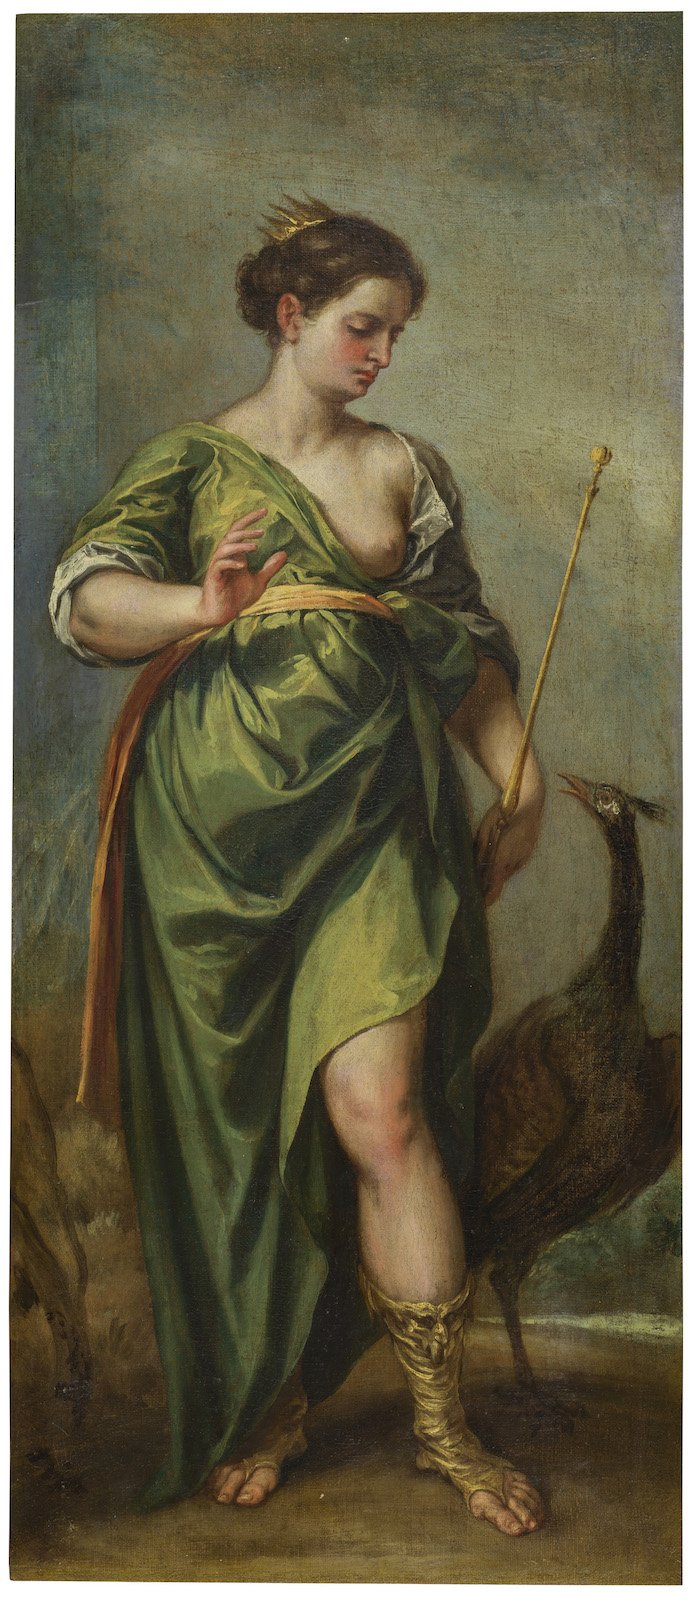 La diosa Juno. Alonso Cano. 1638-1651. Museo Nacional del Prado